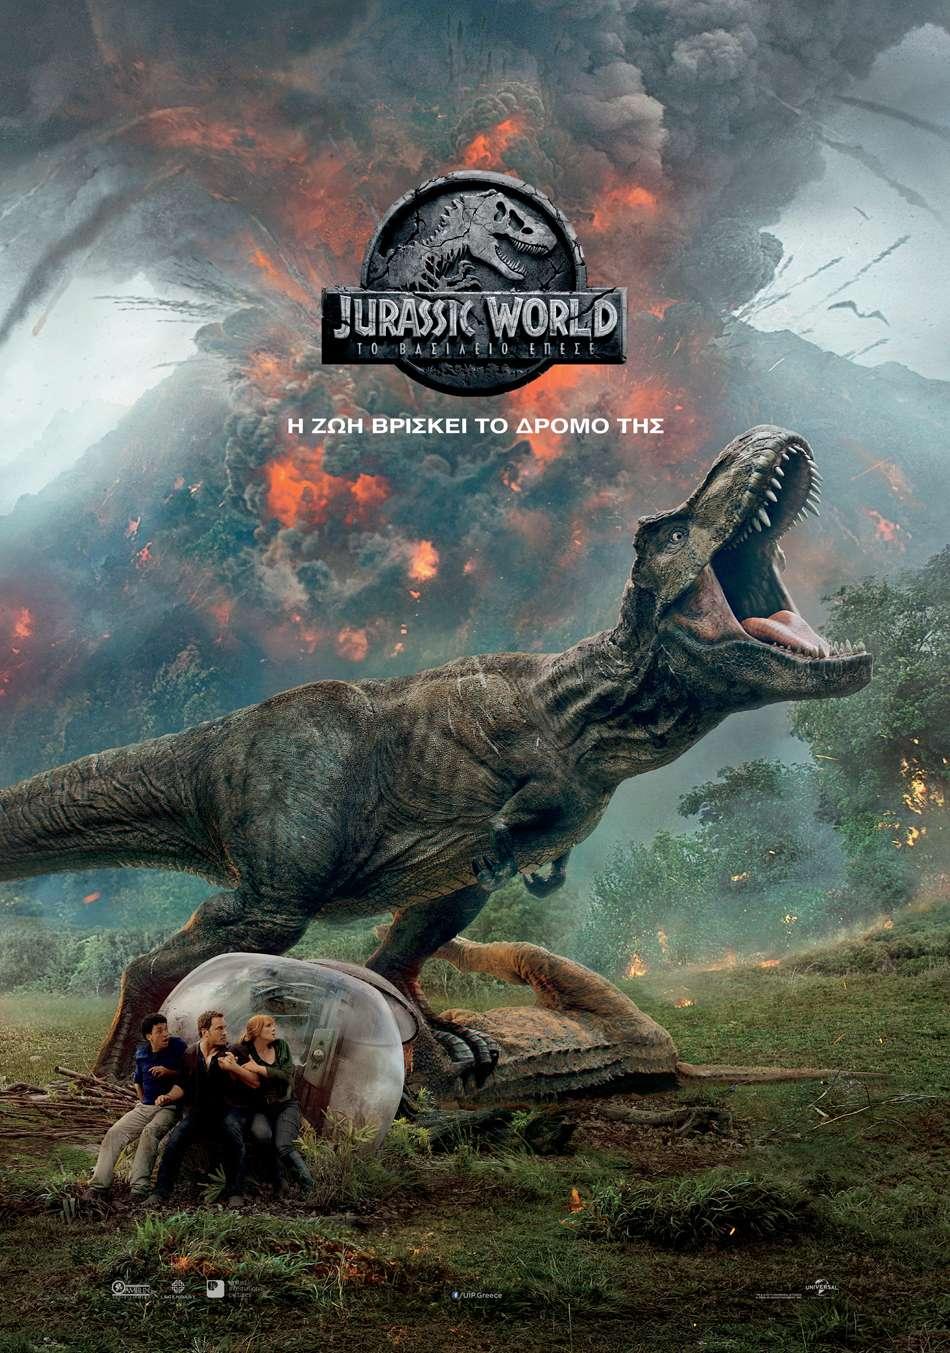 Jurassic World: Το Βασίλειο Έπεσε (Jurassic World: Fallen Kingdom) Poster Πόστερ